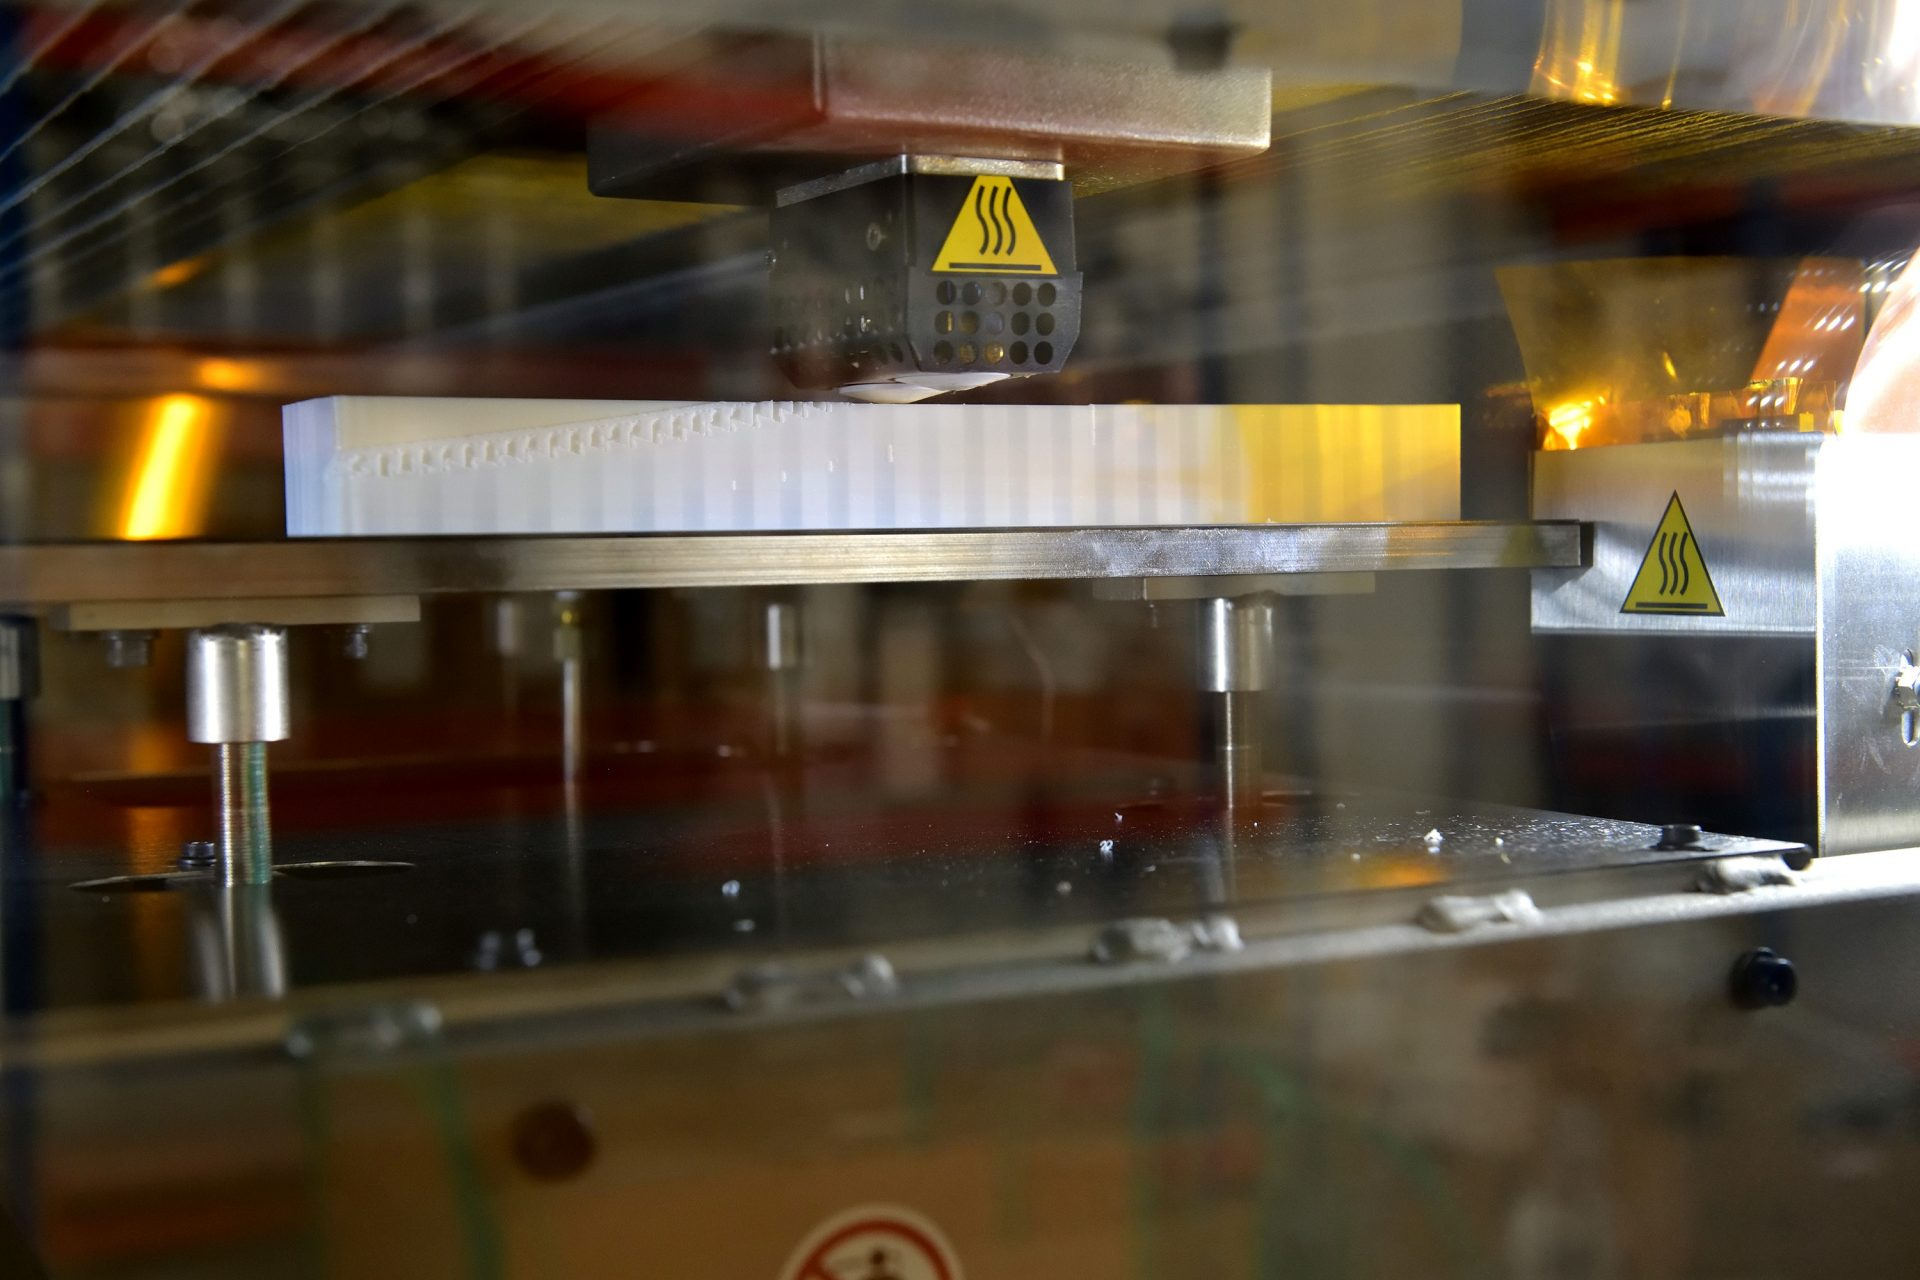 egv-printer-inside-view-skoda-1920x1280